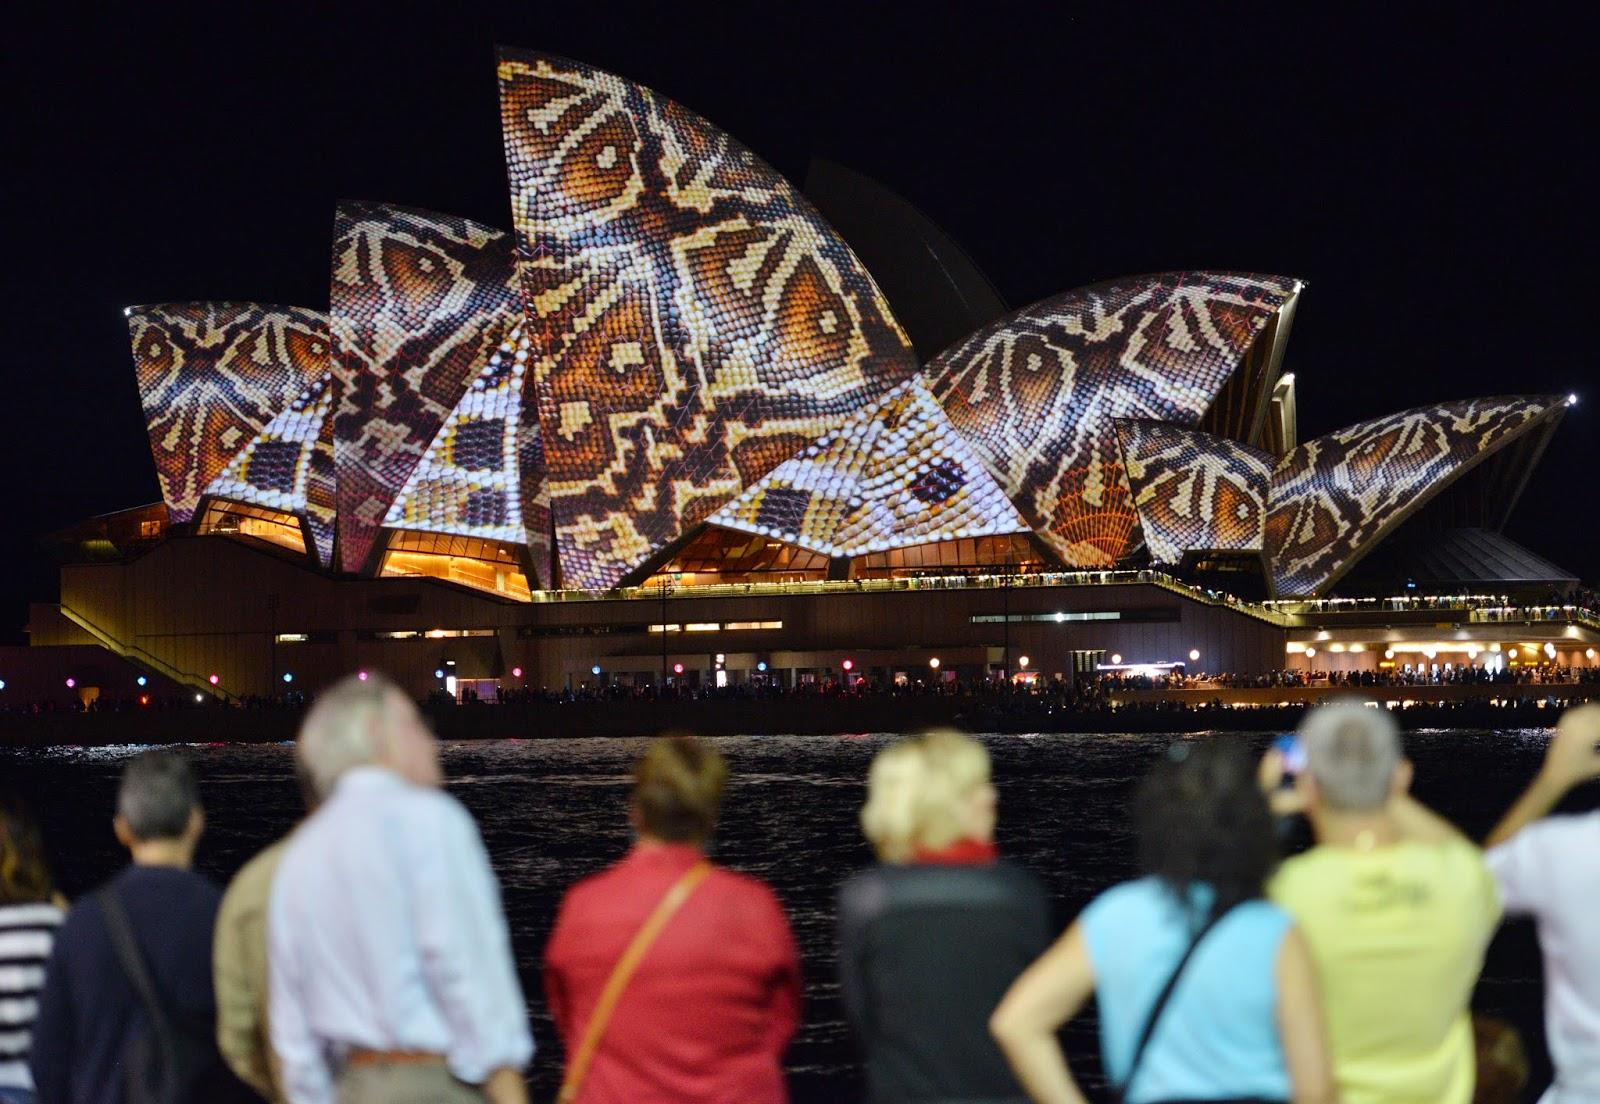 Australia, Culture, Festival, Festival of Lights, Lights Festival, News, Offbeat, Sydney Light Show, Sydney Opera House, Vivid Festival, Vivid Festival Photo,